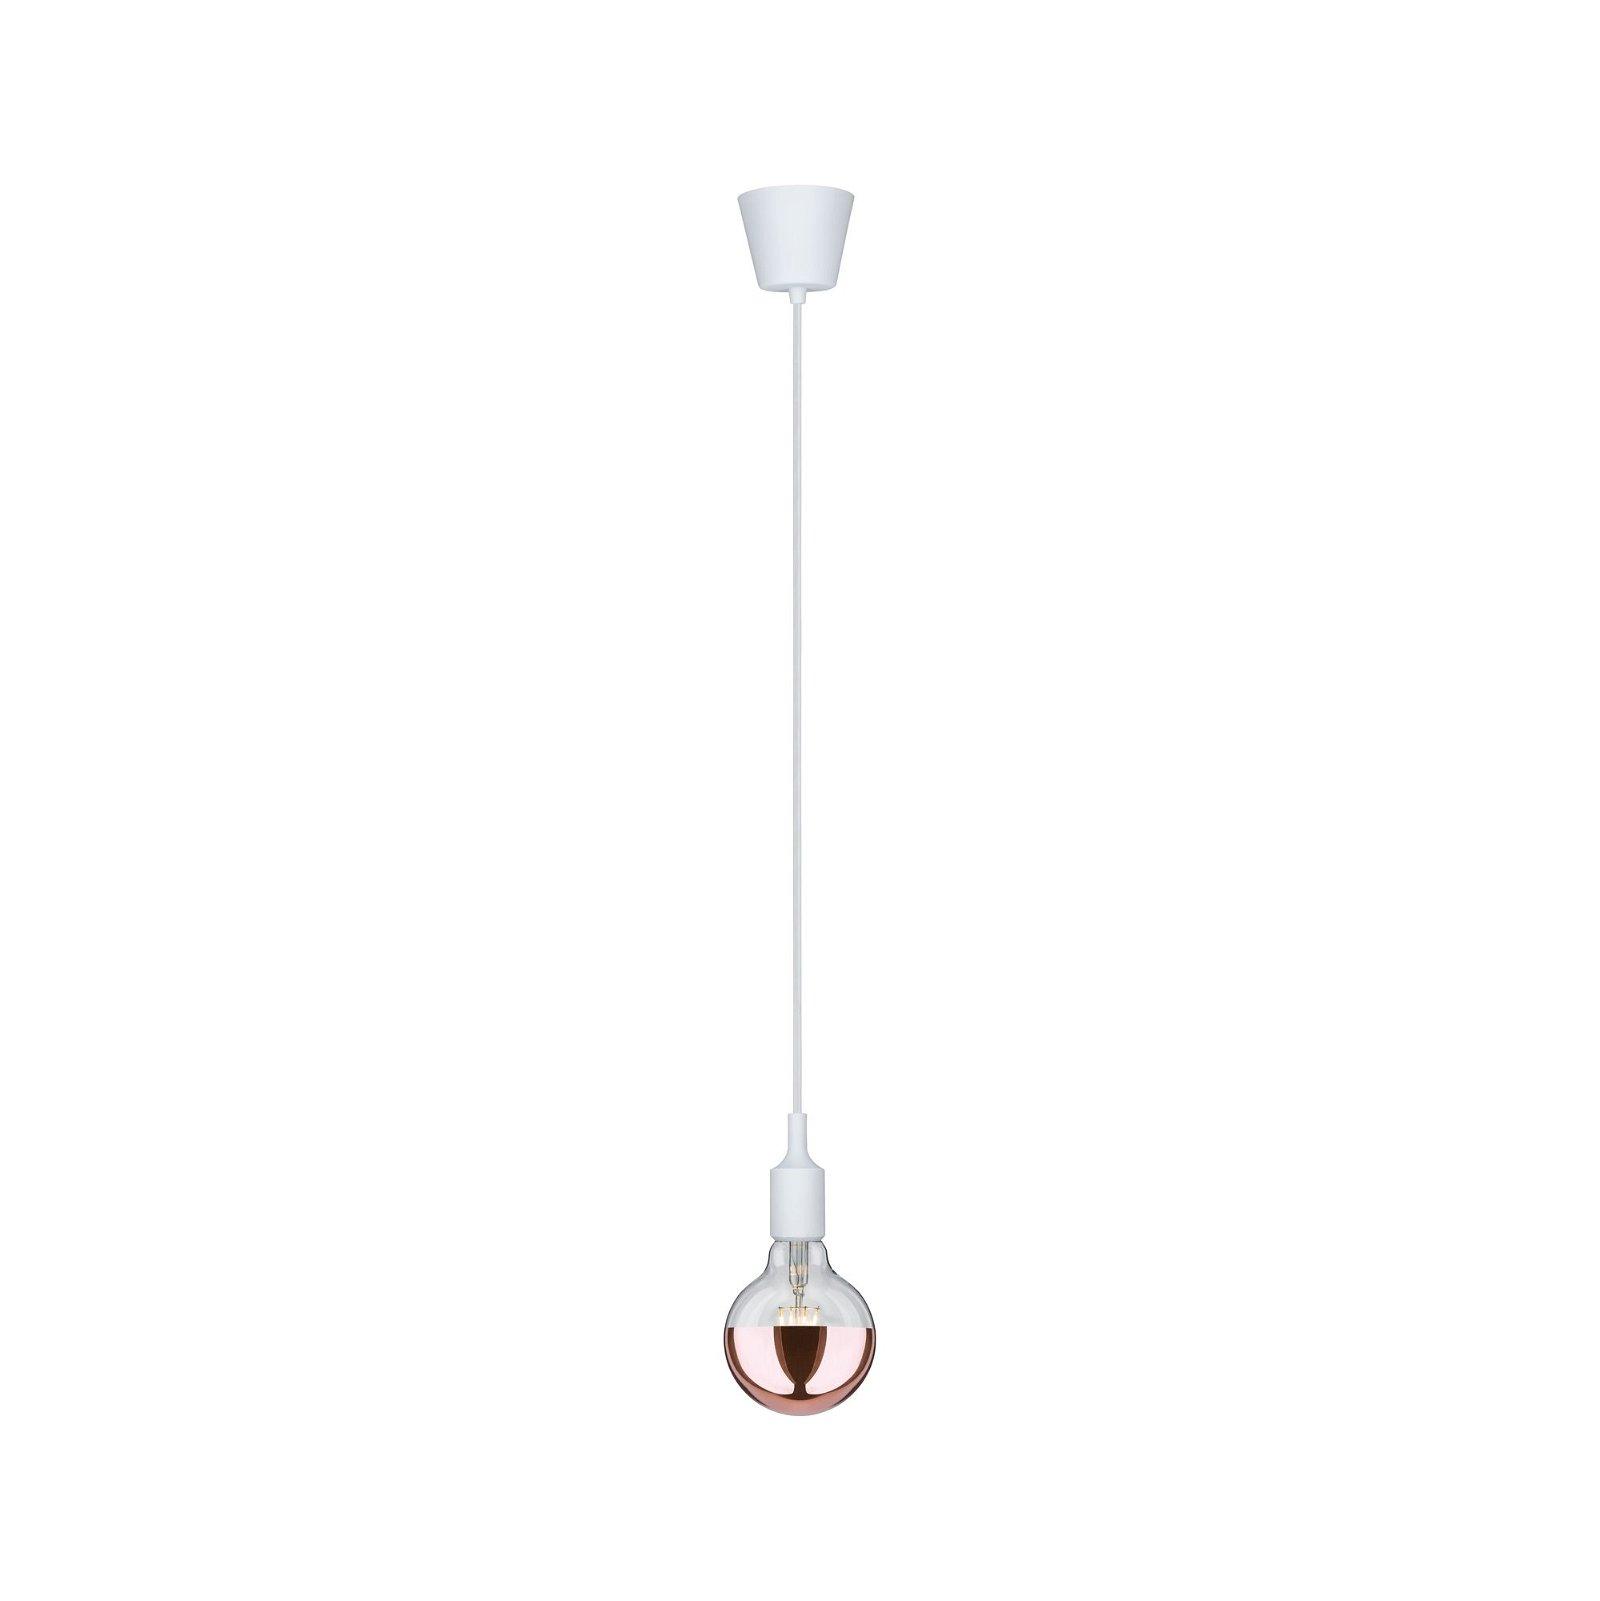 Modern Classic Edition LED Globe Kopfspiegel E27 230V 600lm 6,5W 2700K Kopfspiegel Kupfer